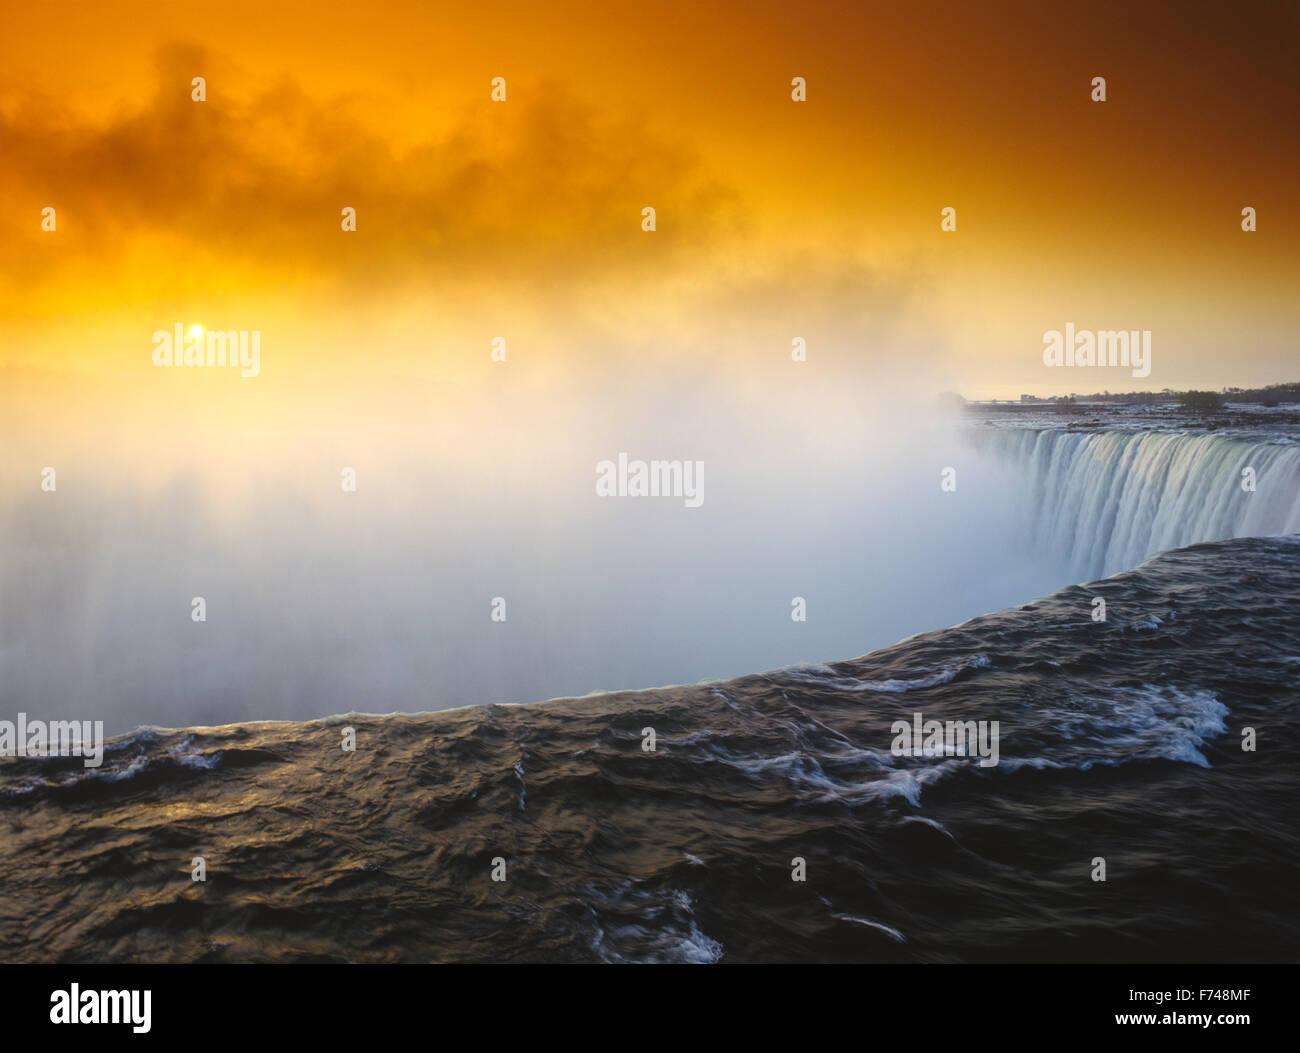 North America, Canada, Ontario, Niagara Falls - Stock Image